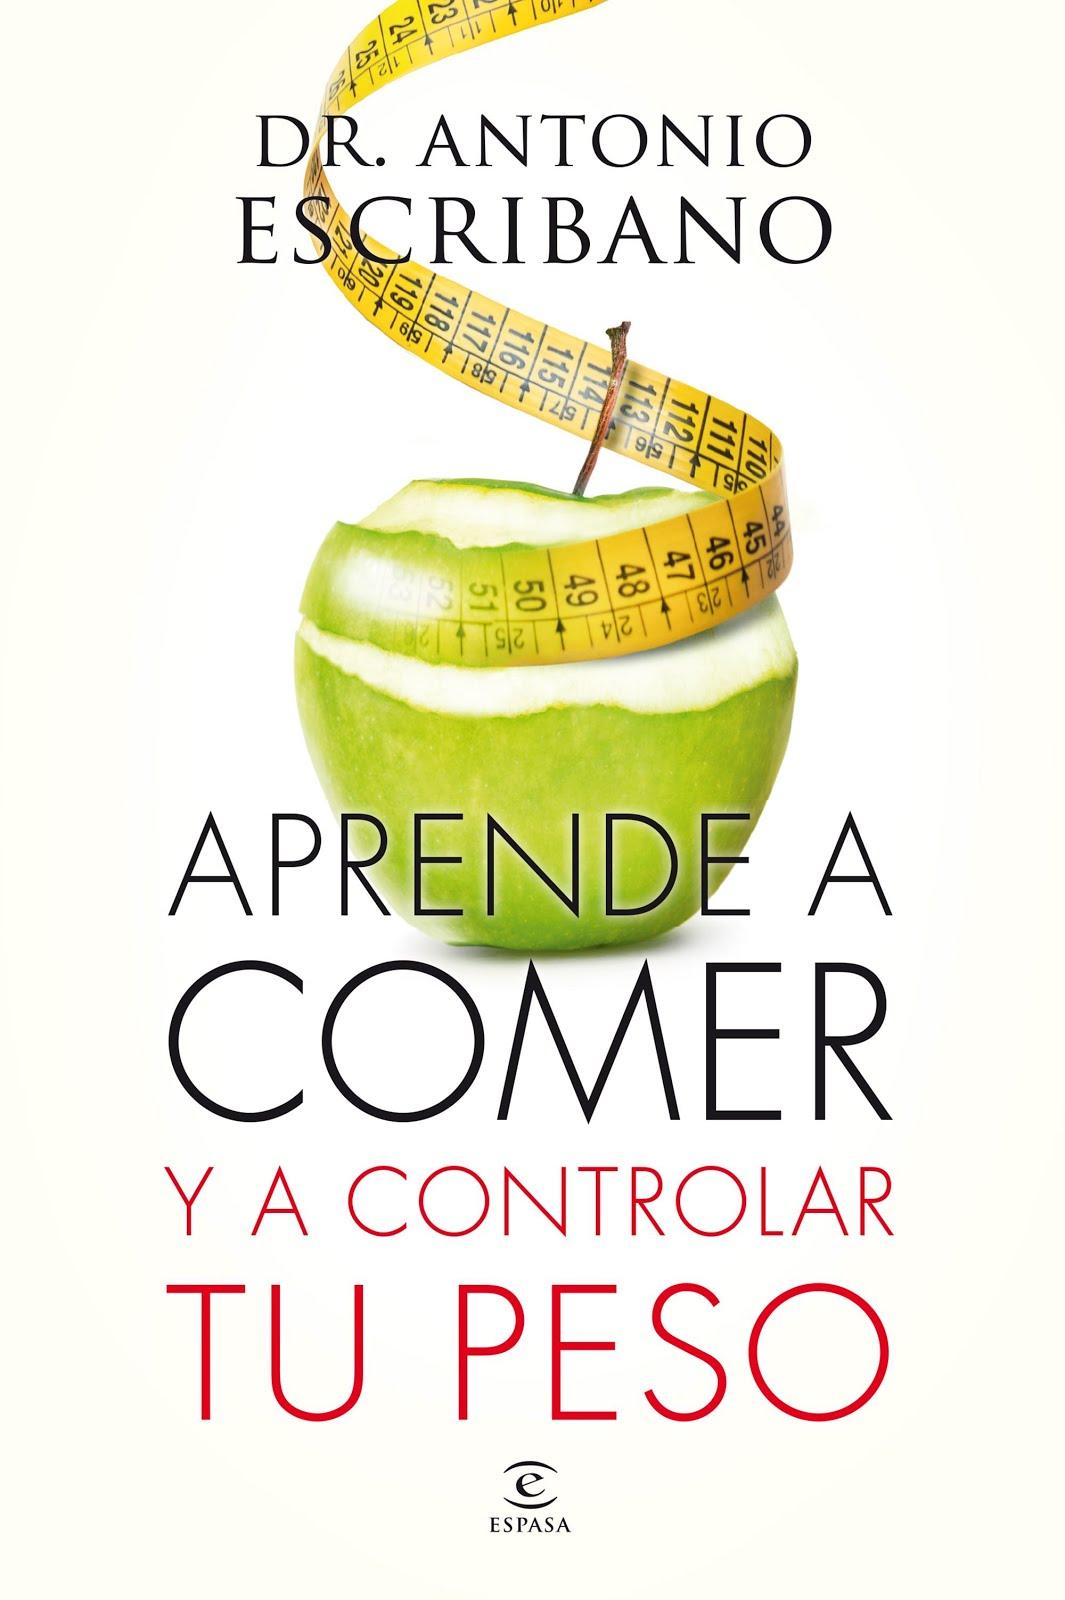 Libro Dr. A.Escribano